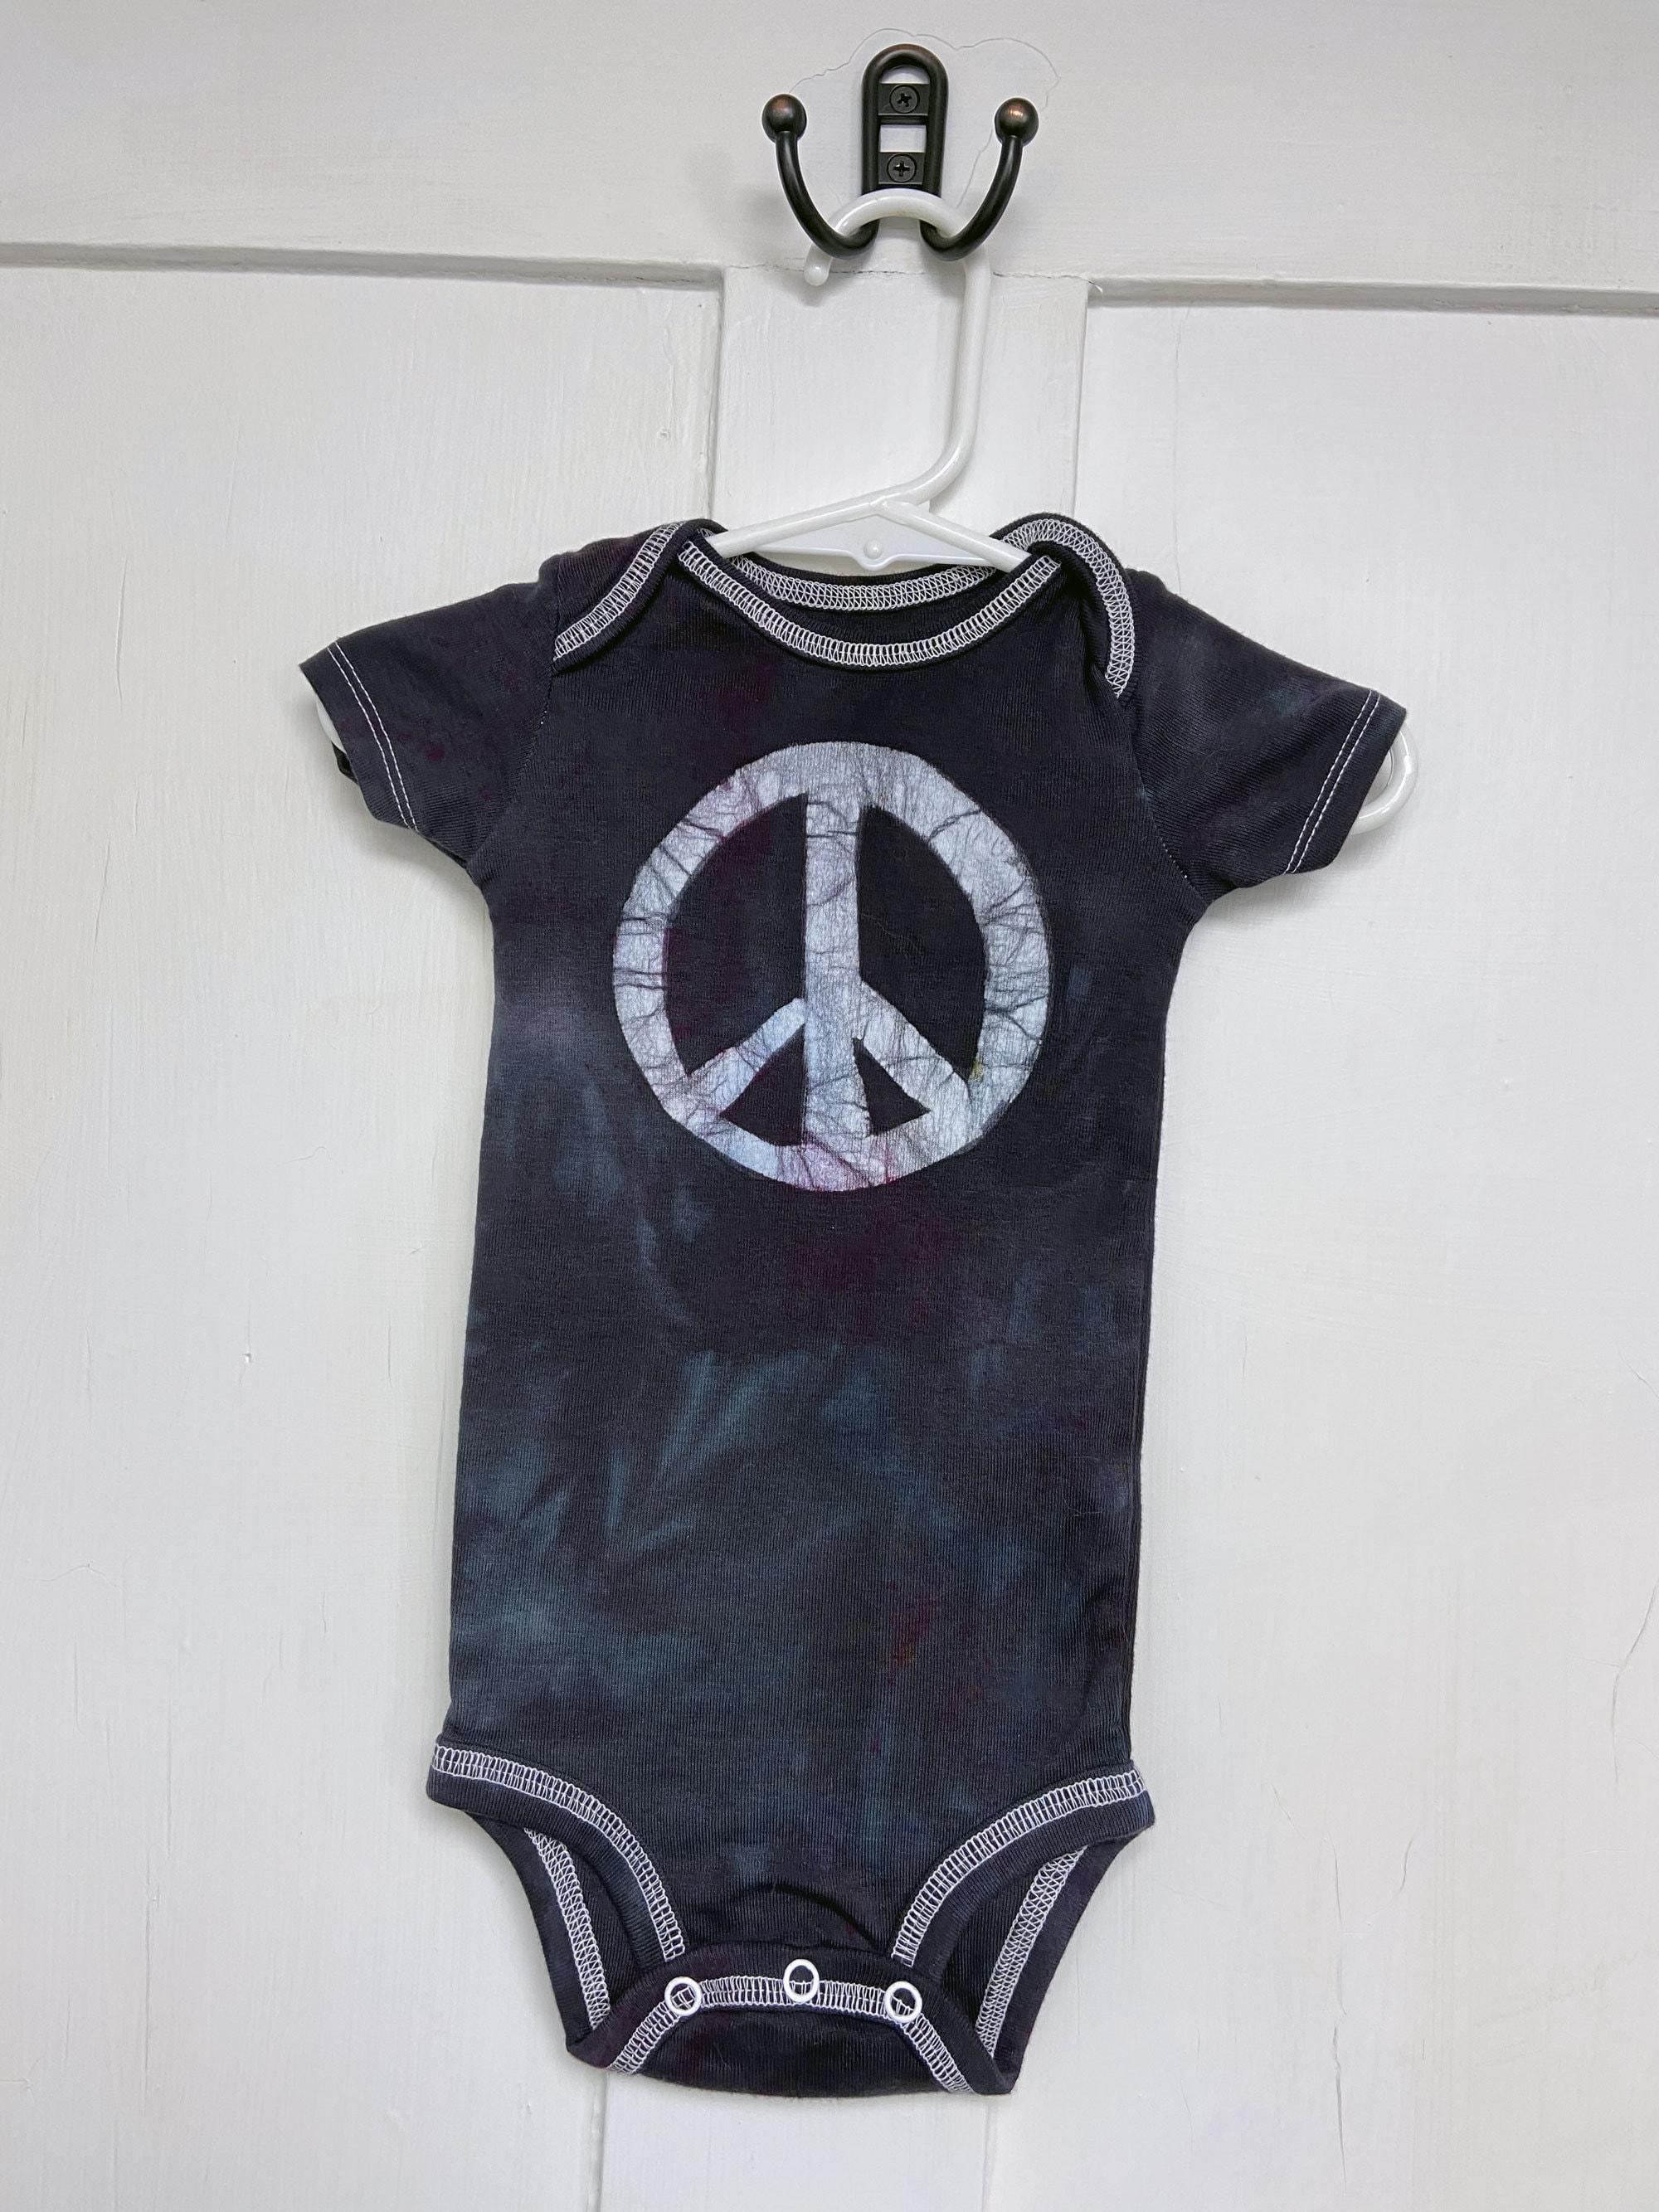 12 month peace sign bodysuit by Peace, Baby! Batiks